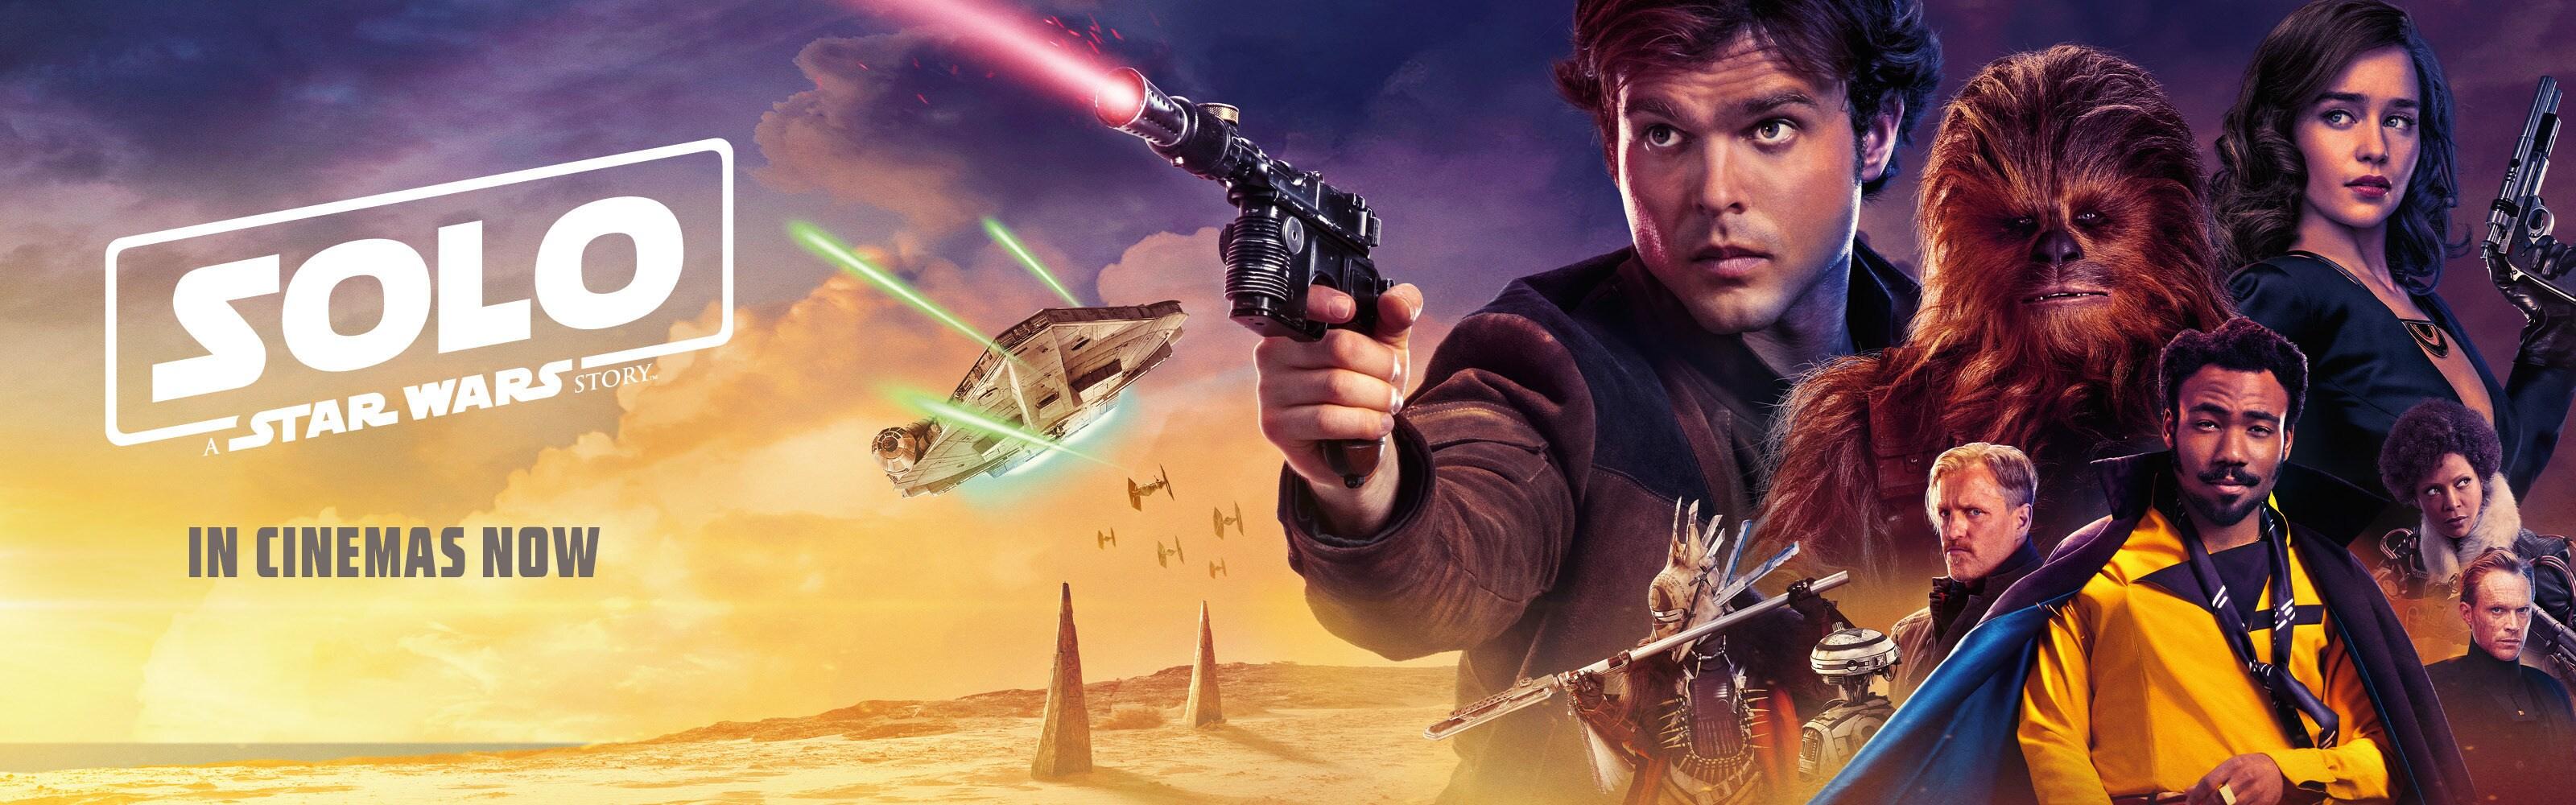 Solo: A Star Wars Story - In Cinemas